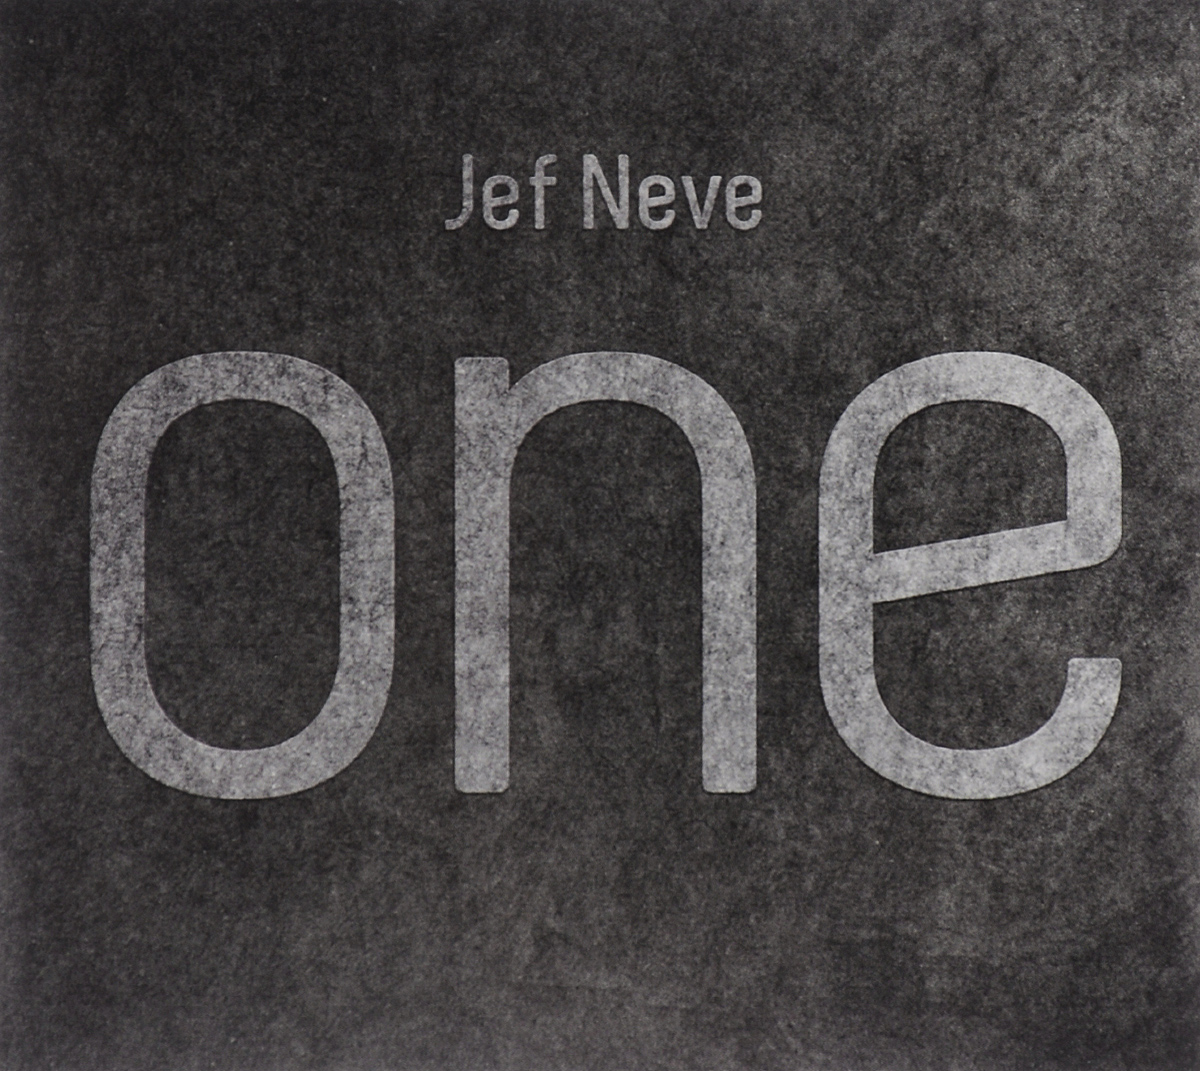 Джеф Неве Jef Neve. One